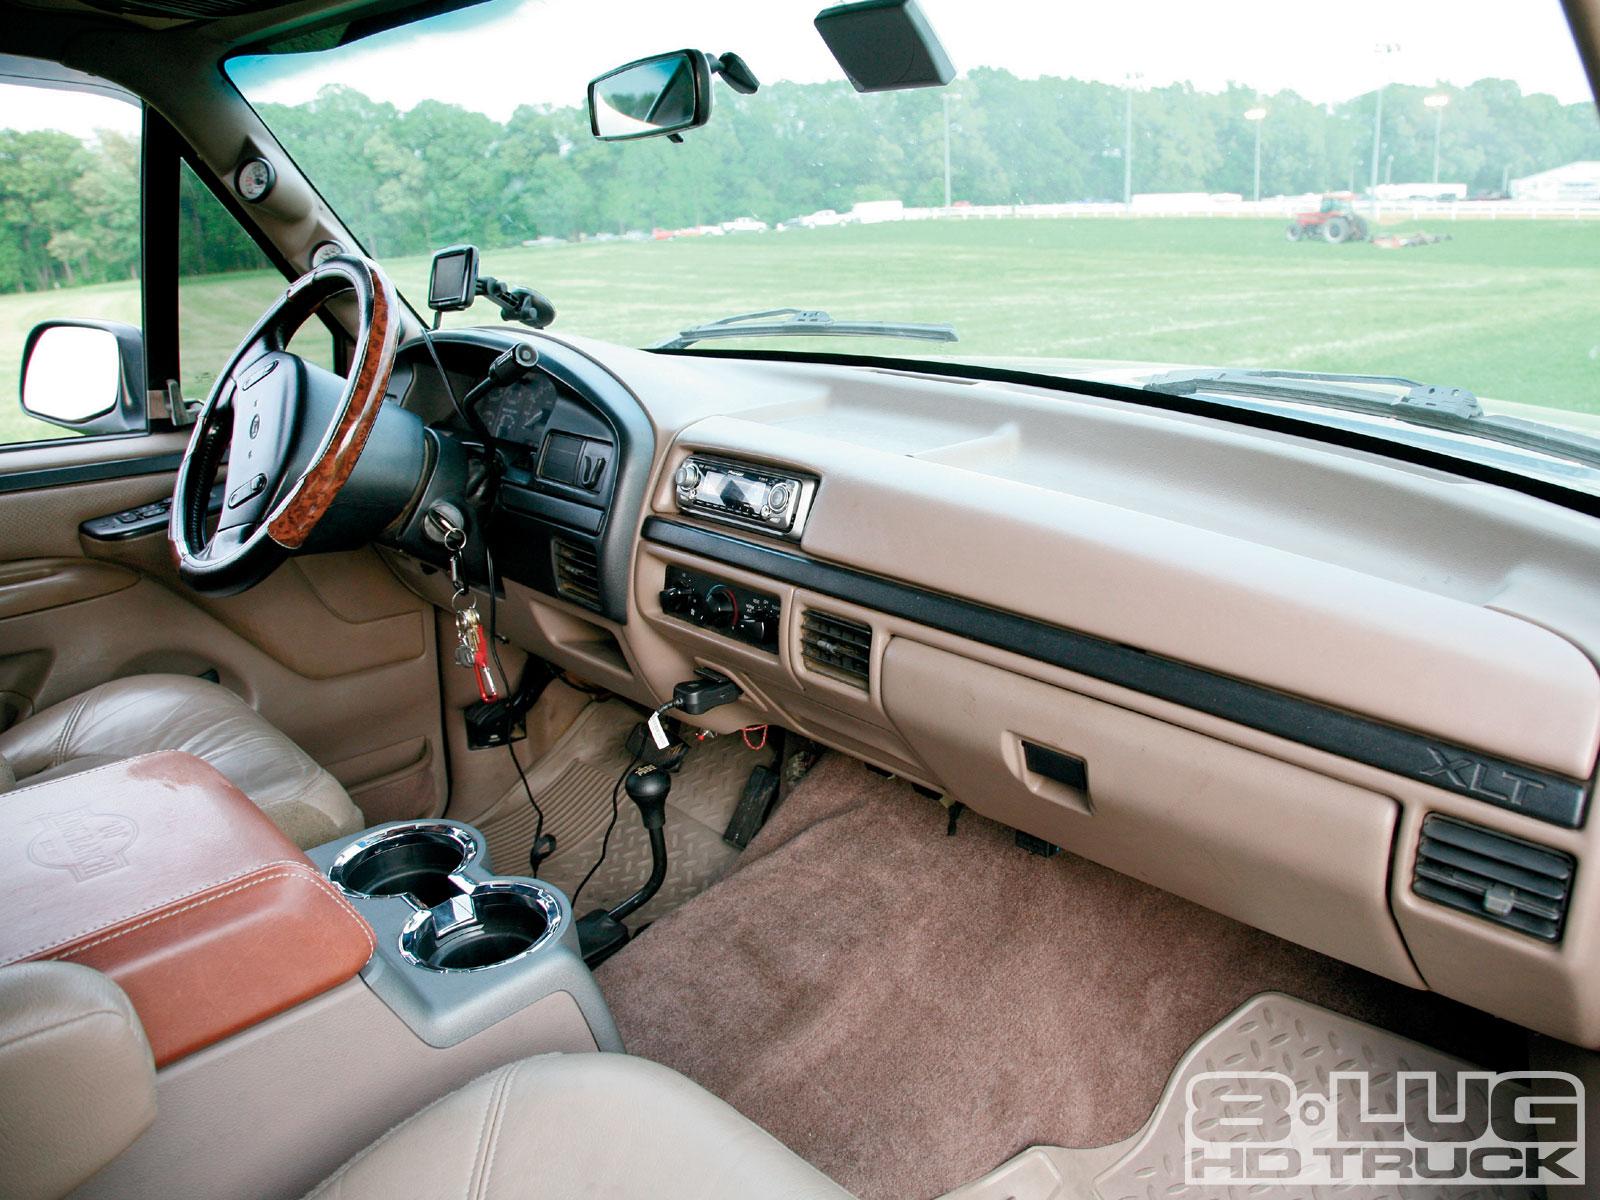 1996 Ford F350 Super Duty - Complete Transformation Photo